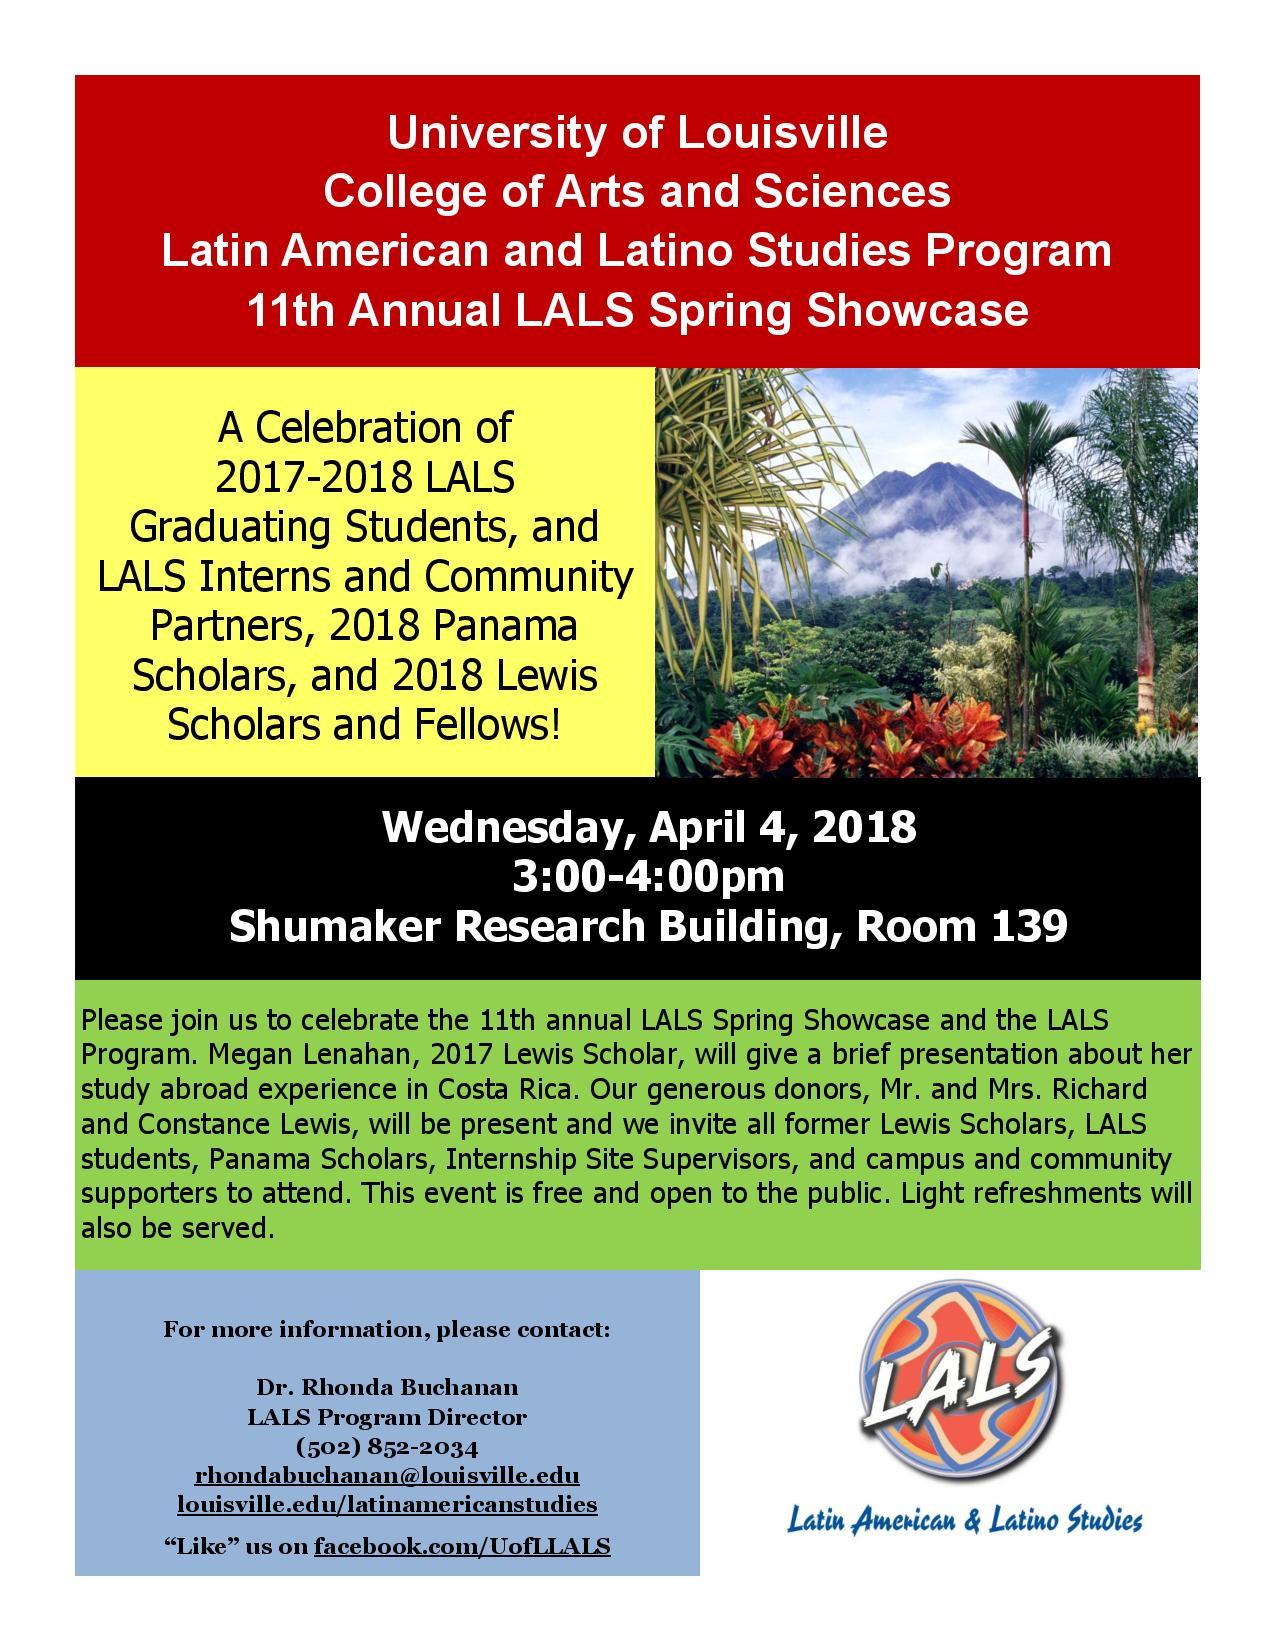 11th Annual Latin American and Latino Studies Spring Showcase